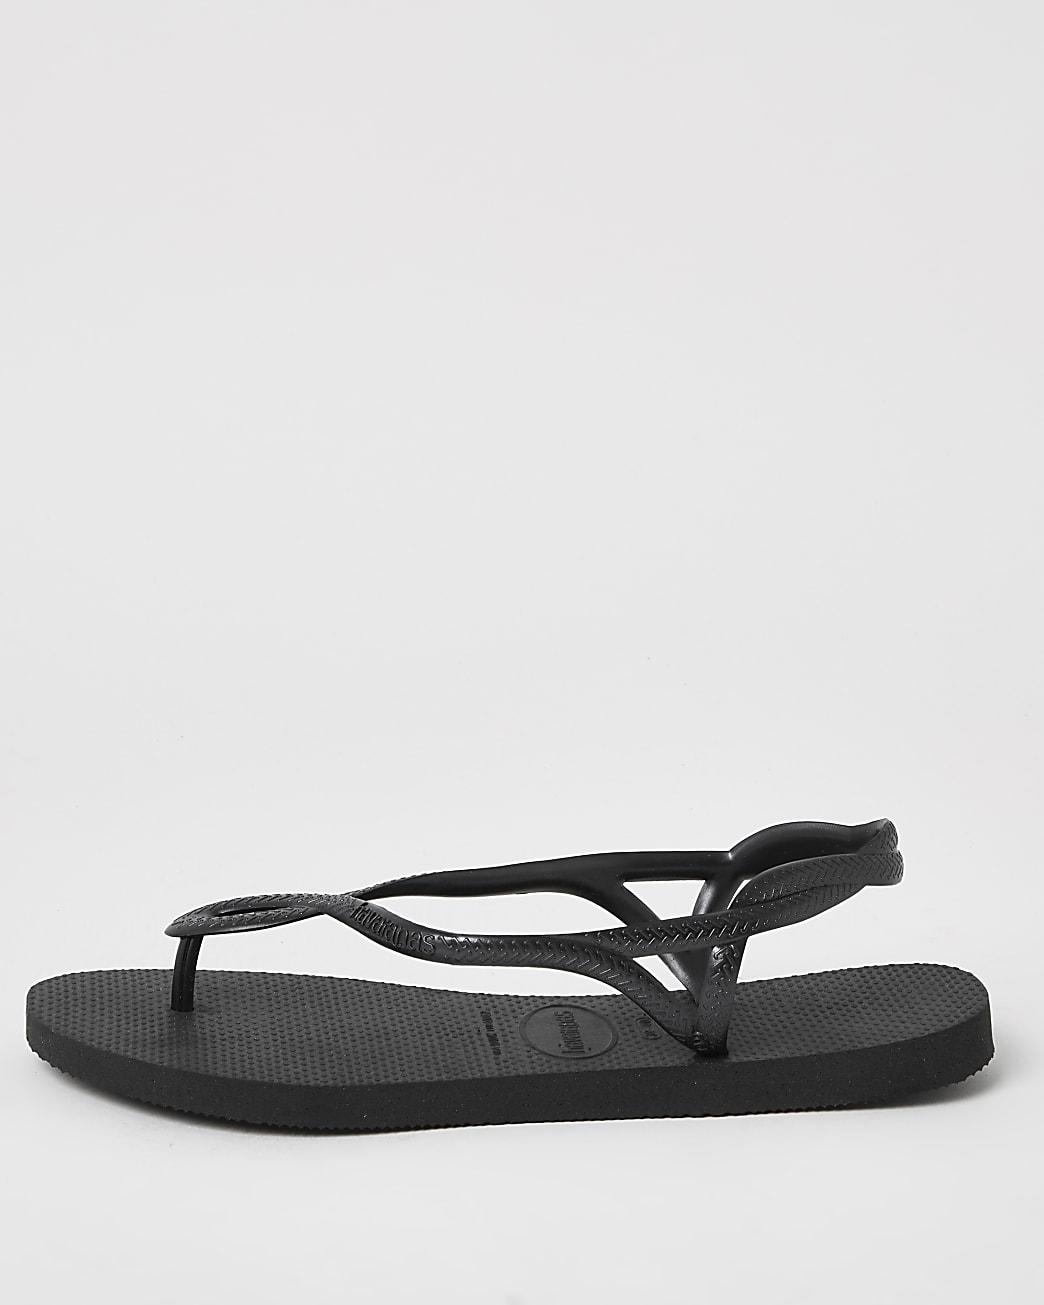 Havaianas Black Twist Strap Rubber Flip Flops